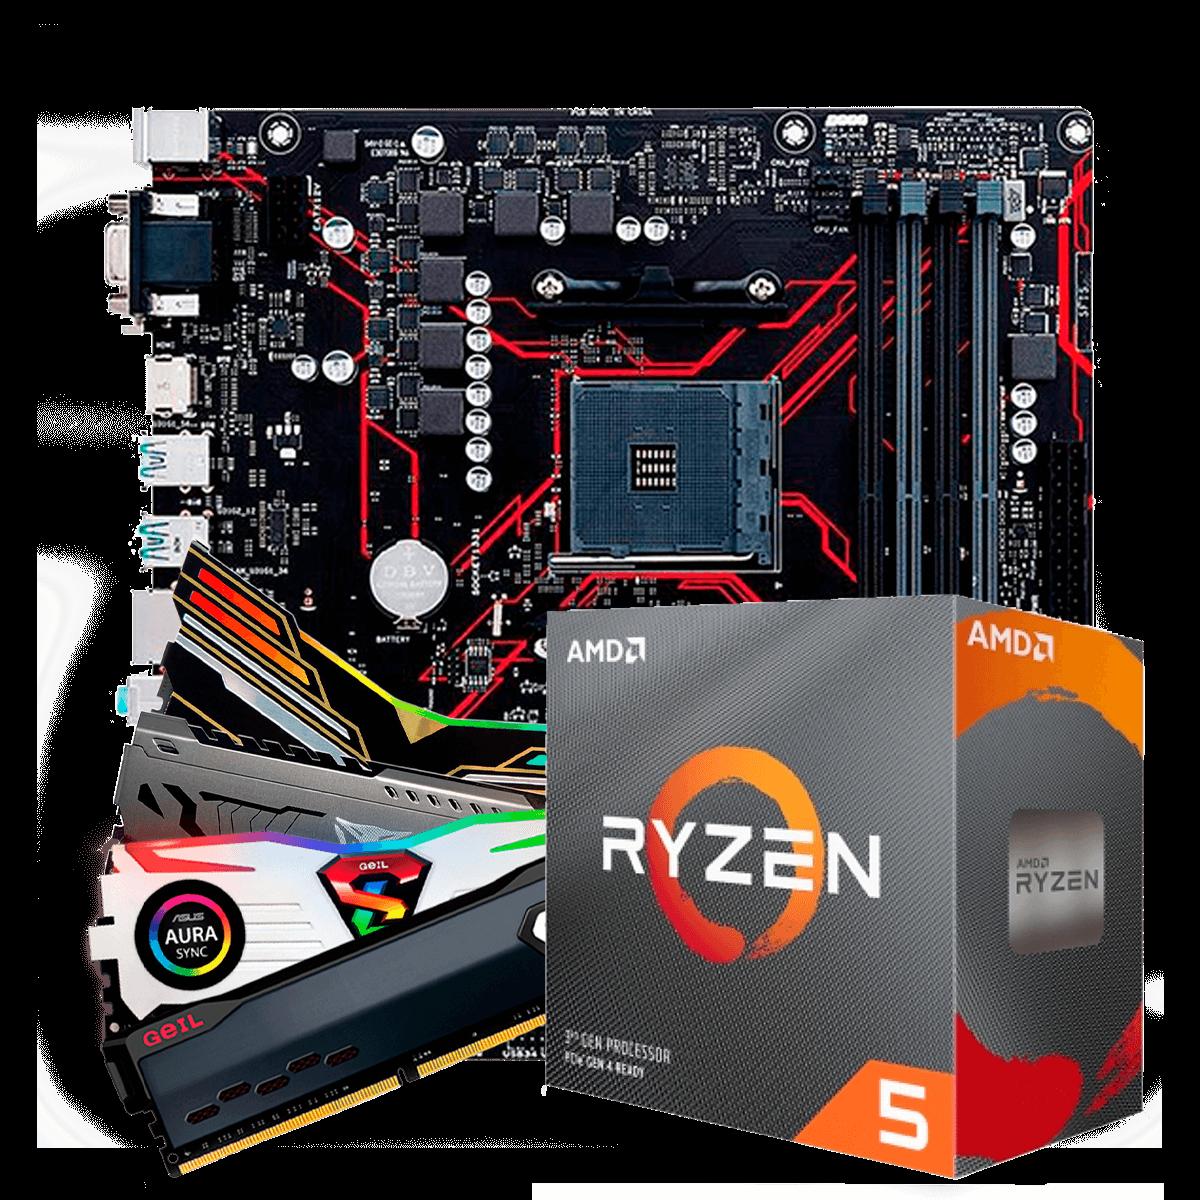 Kit Upgrade, AMD Ryzen 5 2600, Asus Prime B450M Gaming/BR, Memória DDR4 8GB 3000MHZ